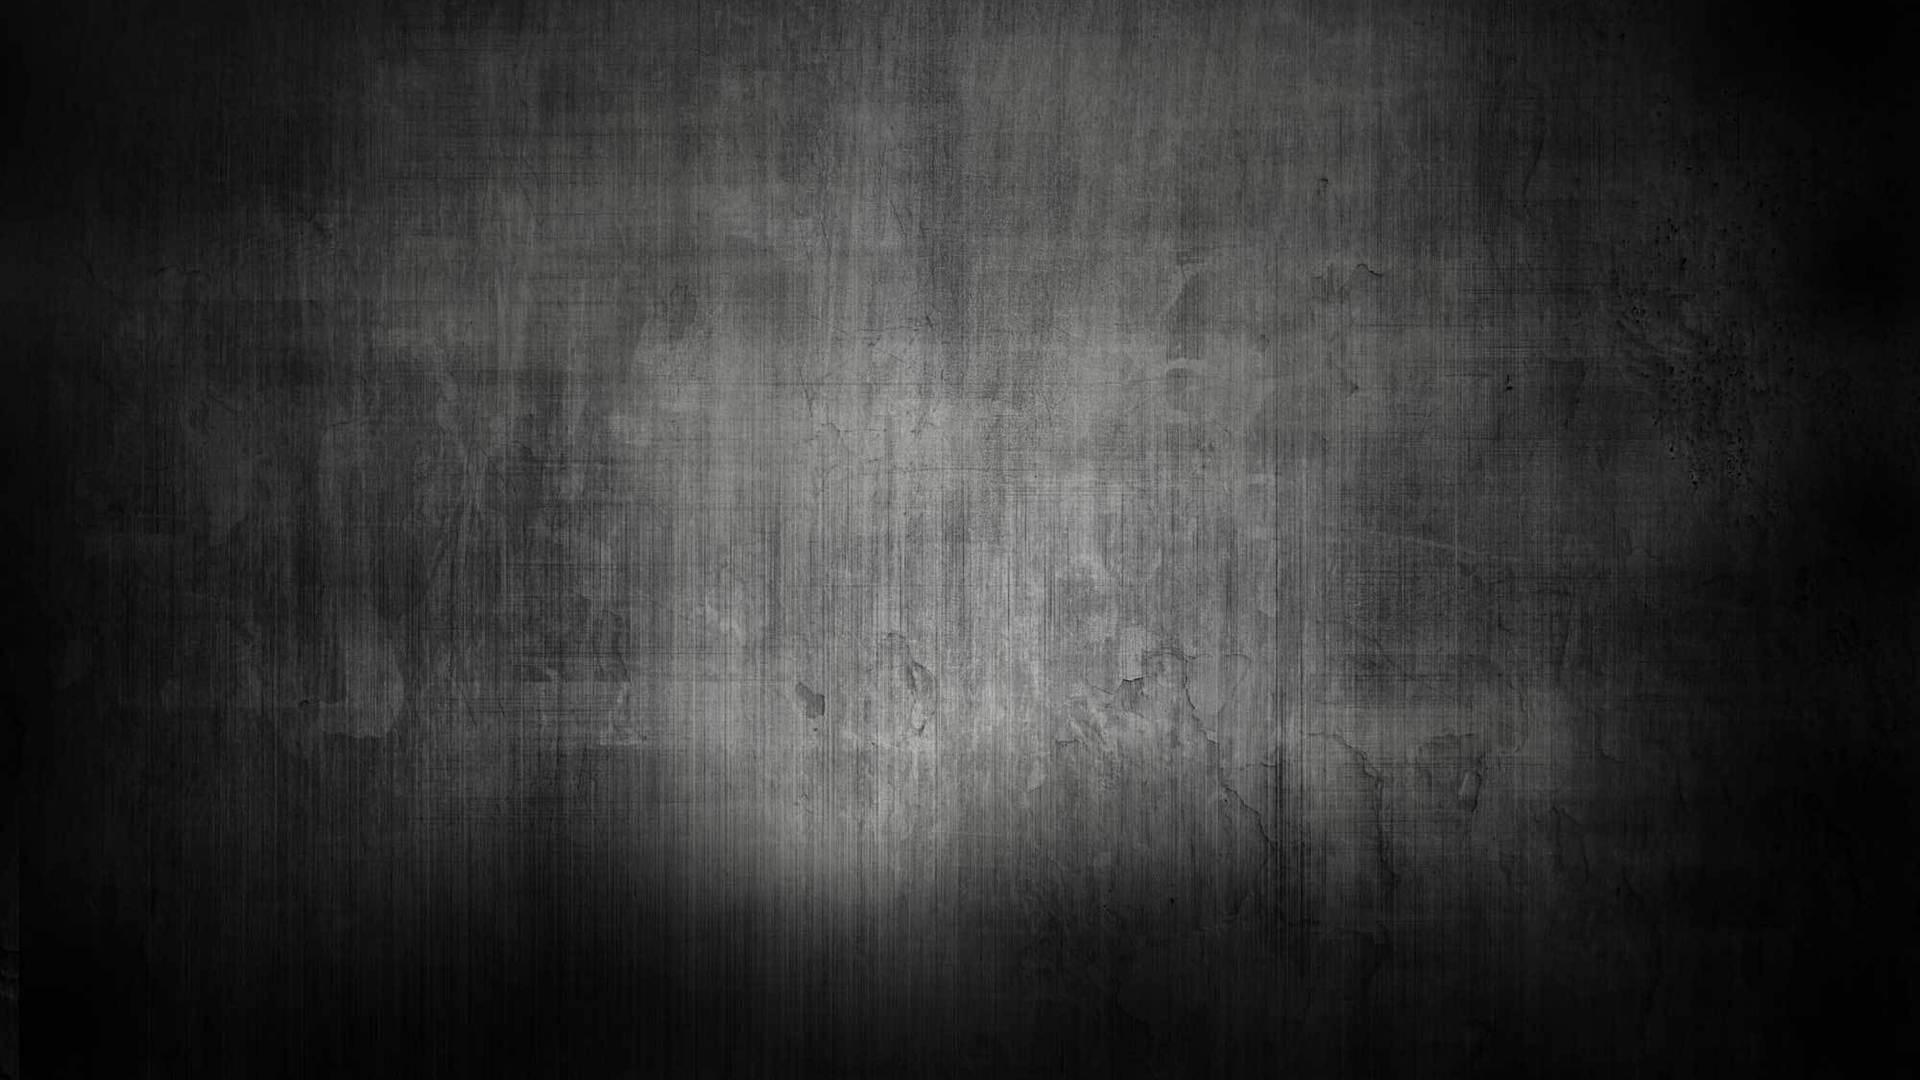 Textured Backgrounds wallpaper 1920x1080 3089 1920x1080